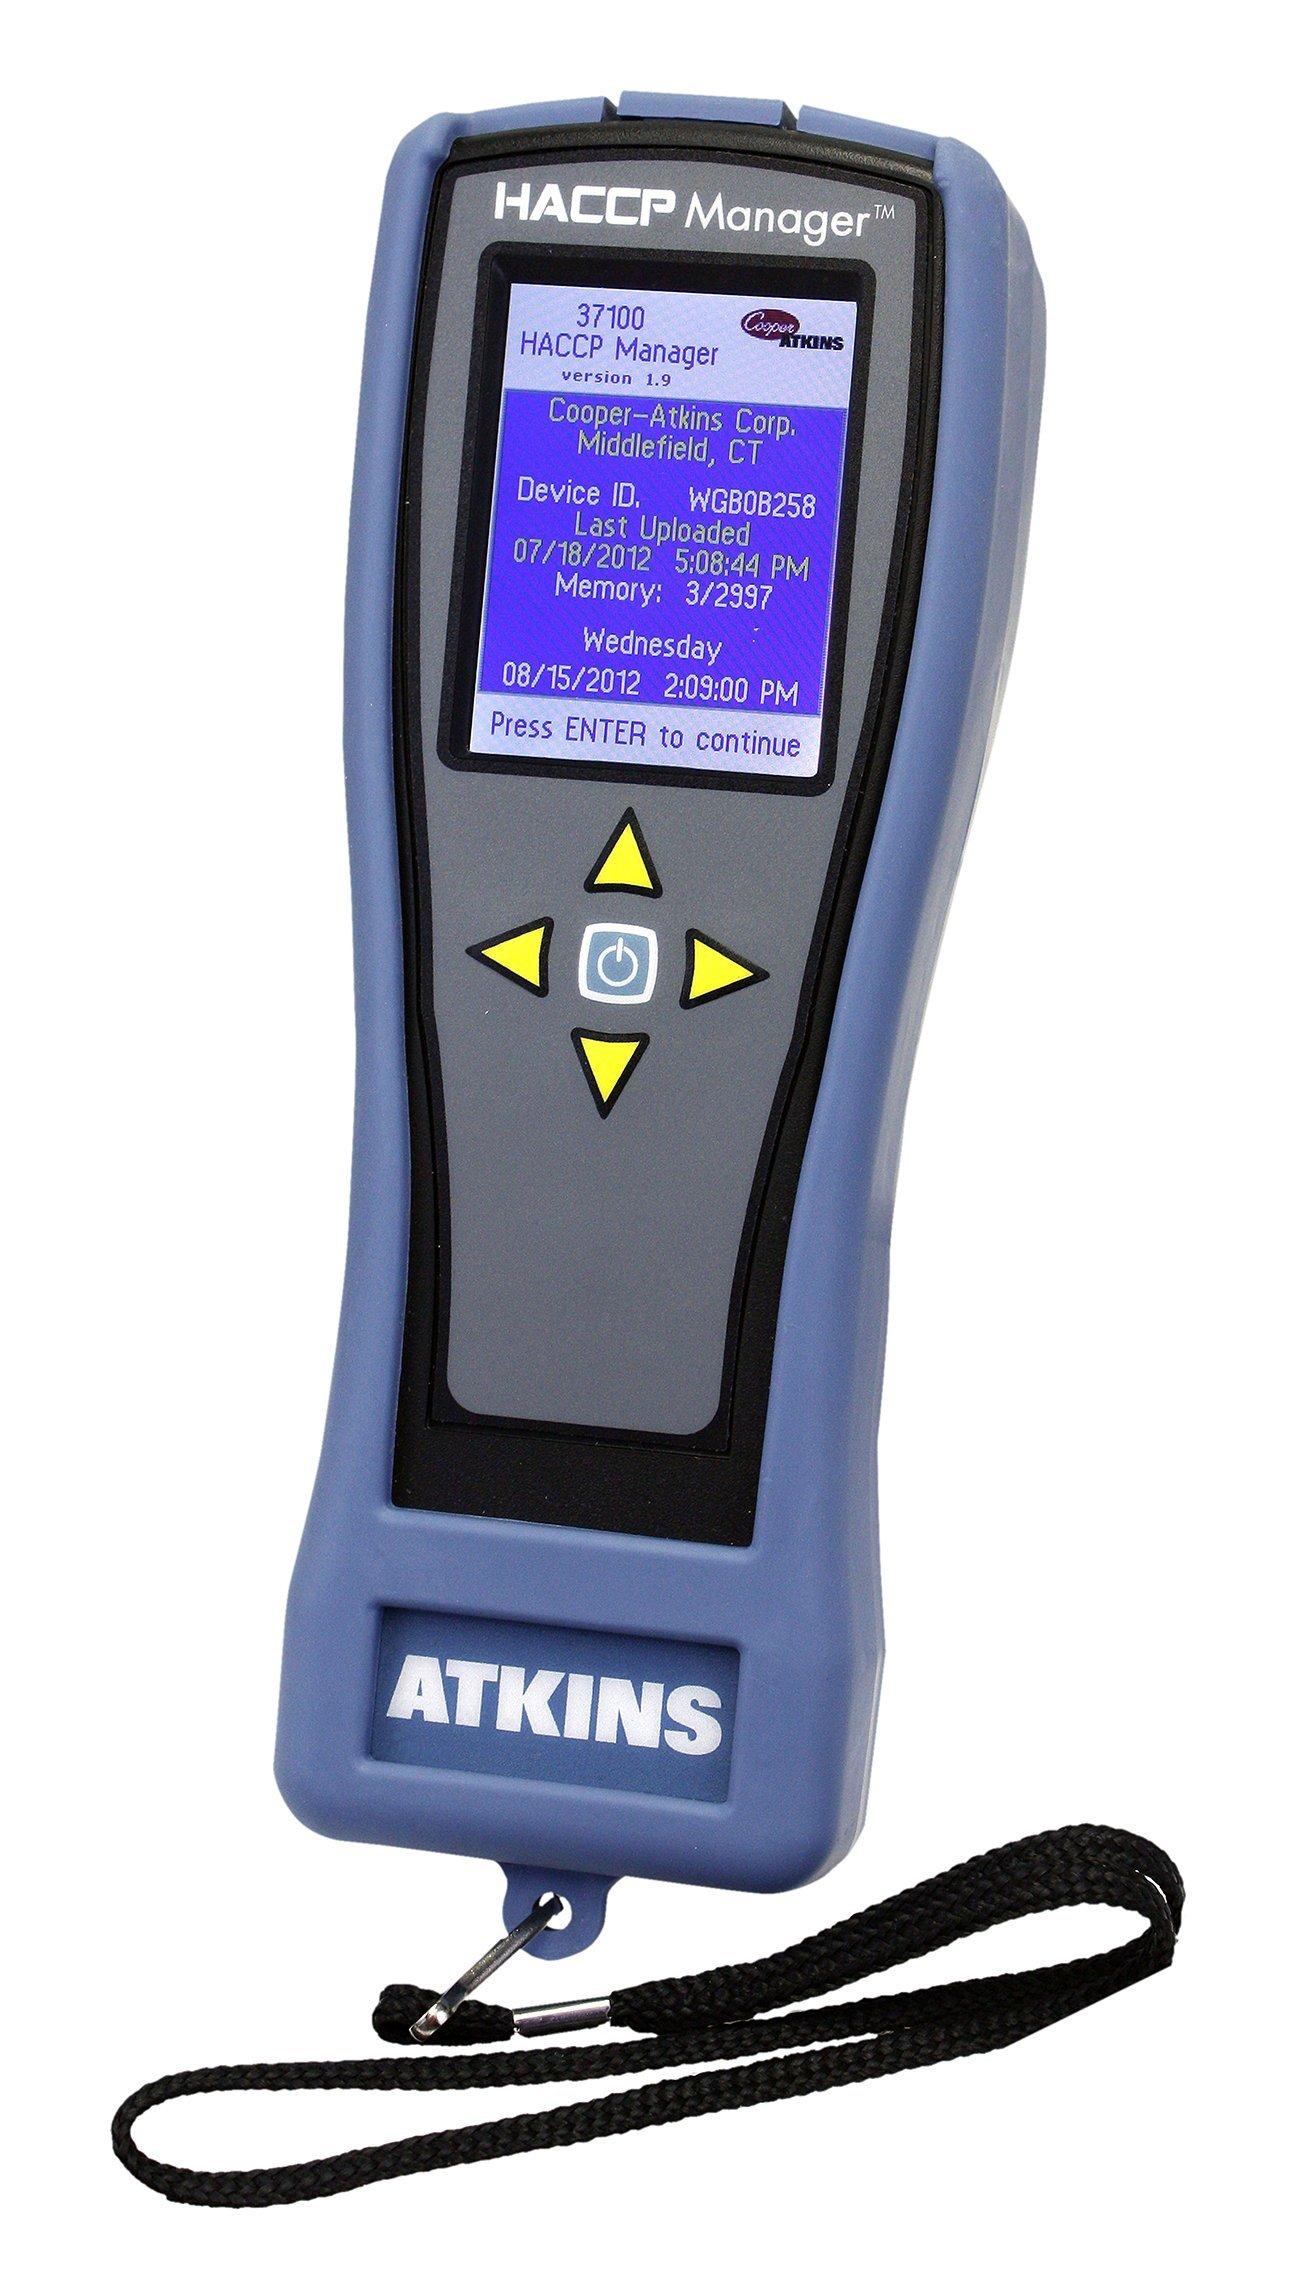 Cooper-Atkins 37100 Waterproof HACCP Manager Handheld Instrument, NSF Certified, -99.9° to 999.9°F Temperature Range